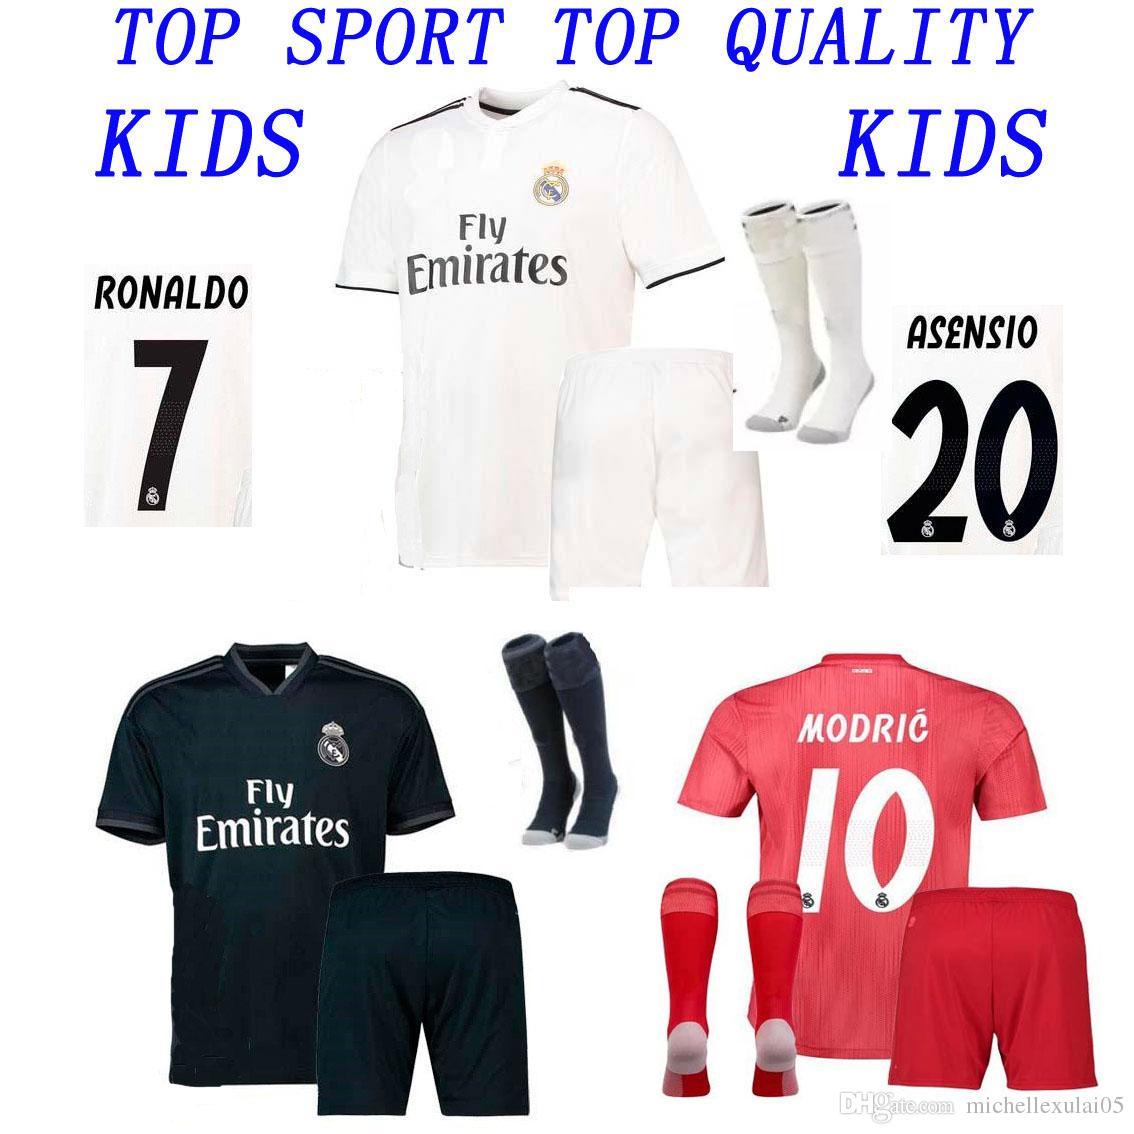 Compre 18 19 Kid Kit Real Madrid Jersey De Fútbol 2018 19 Boys Soccer Sets  Bale ISCO KROOS MODRIC Camisetas De Fútbol Niño Fútbol Jersey Shorts  Calcetín A ... aaee447e0ab34